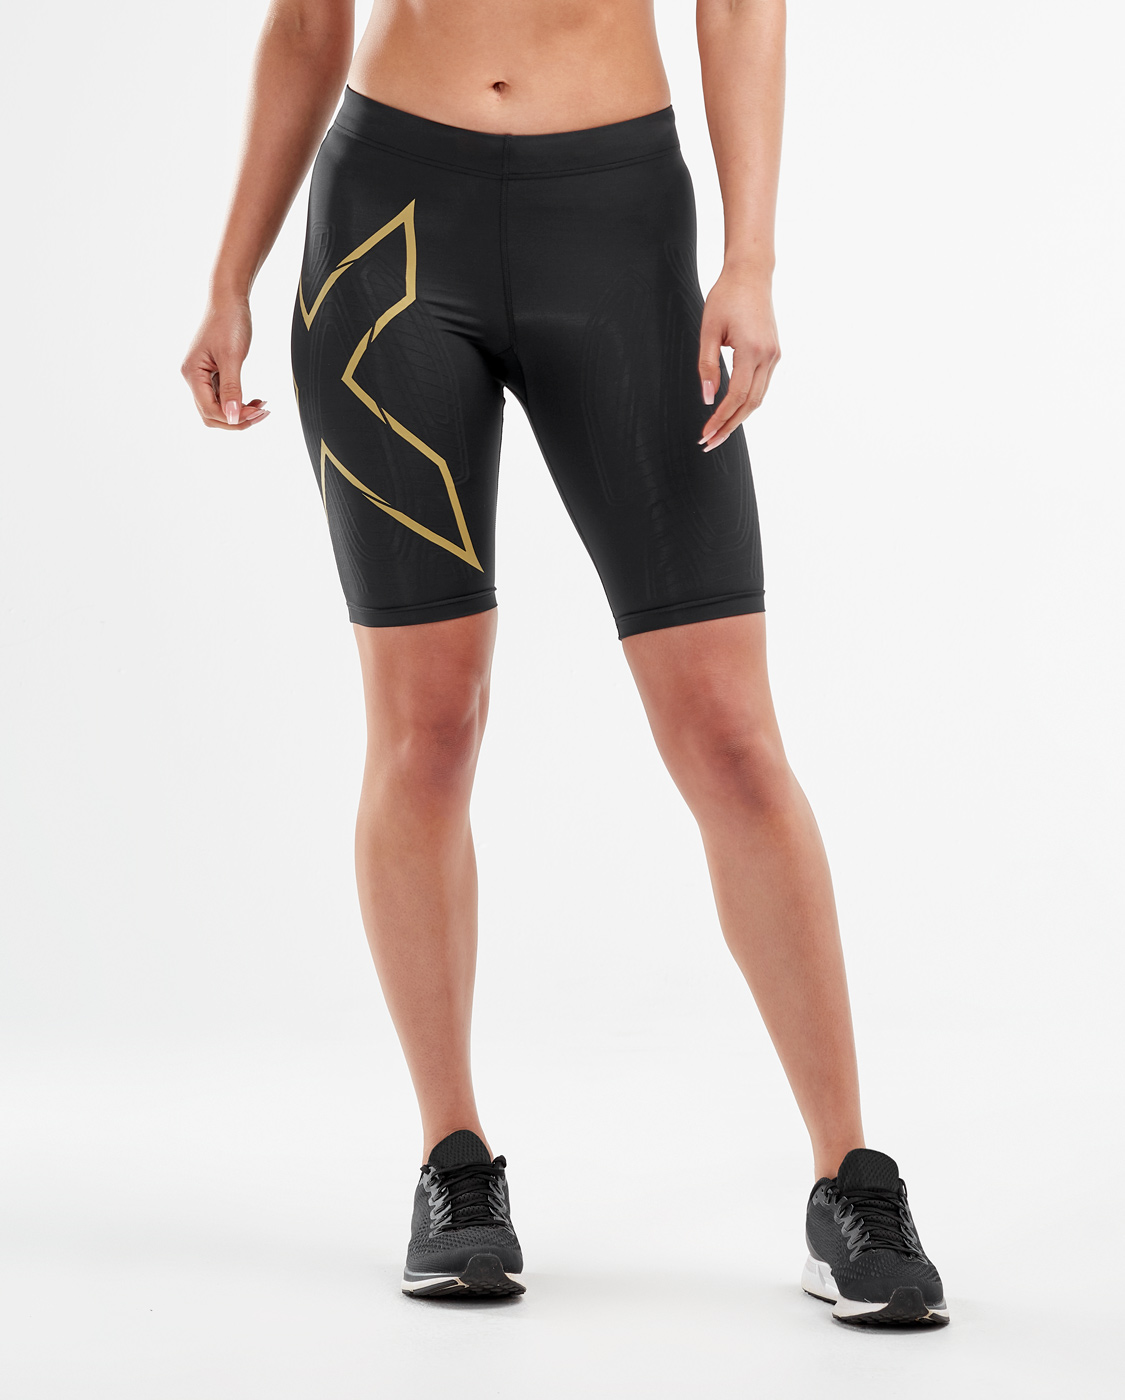 2XU Women's MCS Run Shorts - Black/Gold Reflective